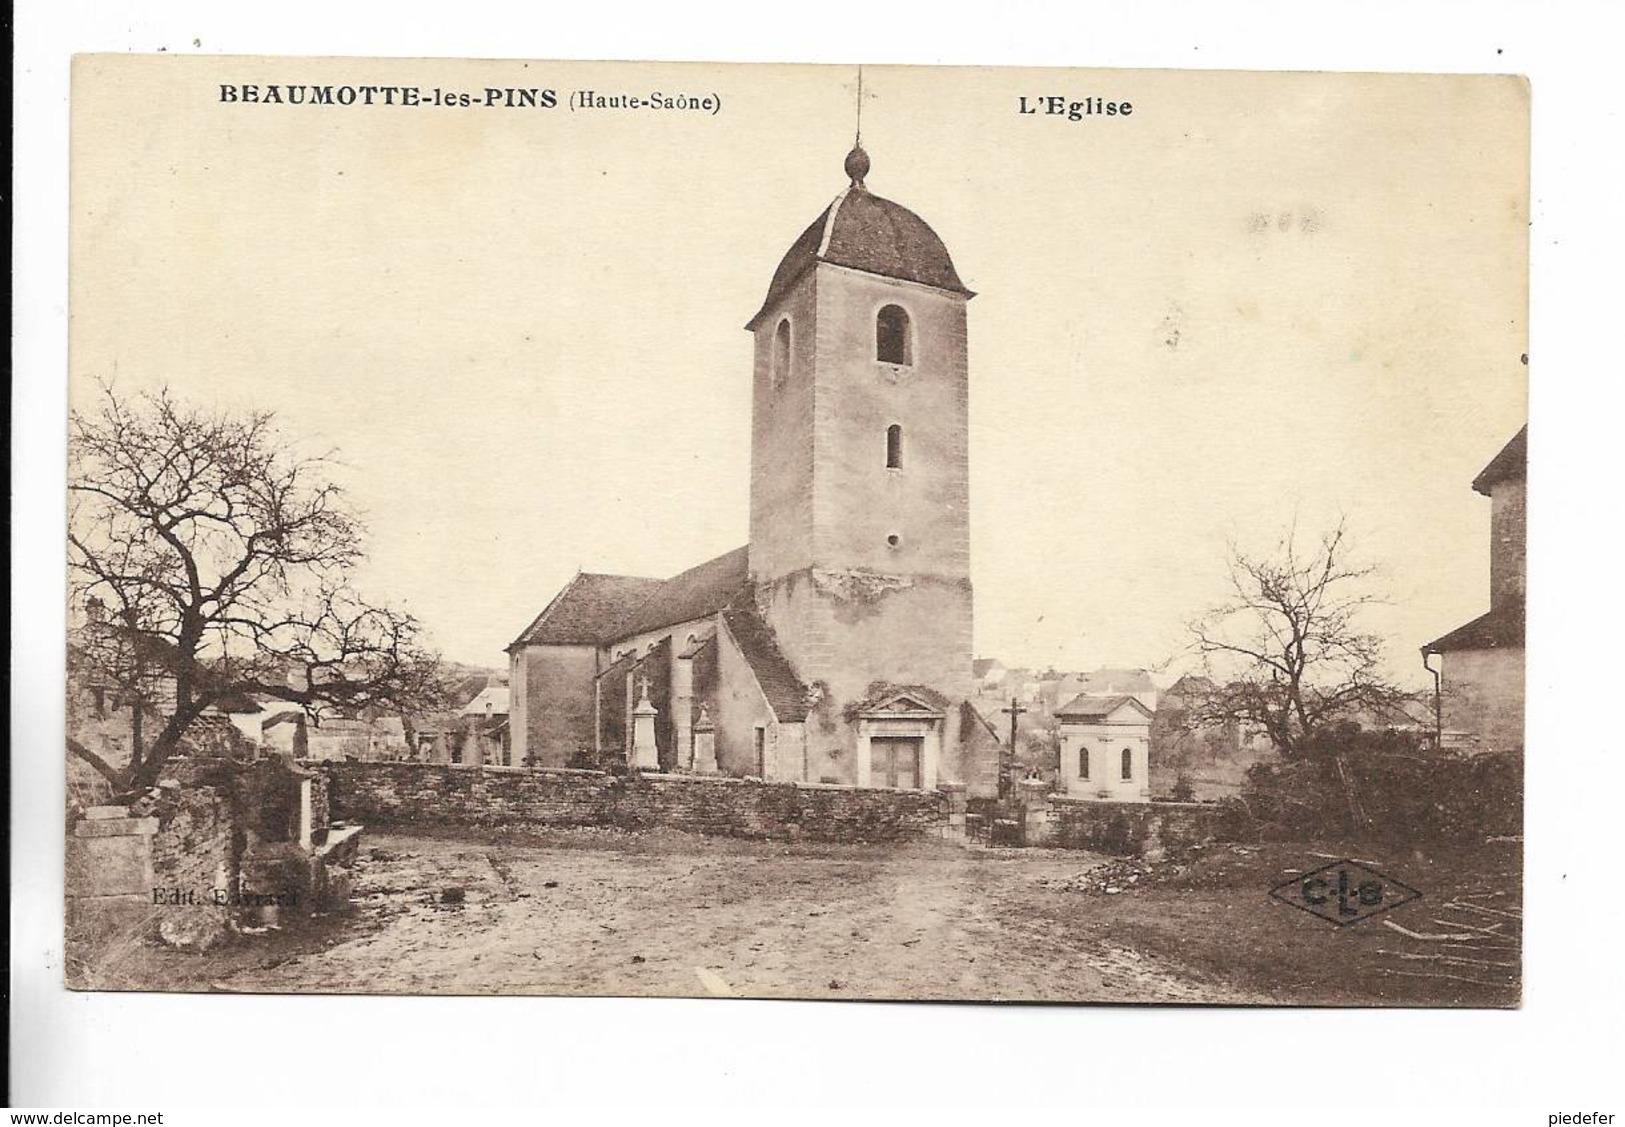 70 - RARE Cliché - BEAUMOTTE-les-PINS - L' Eglise - Francia